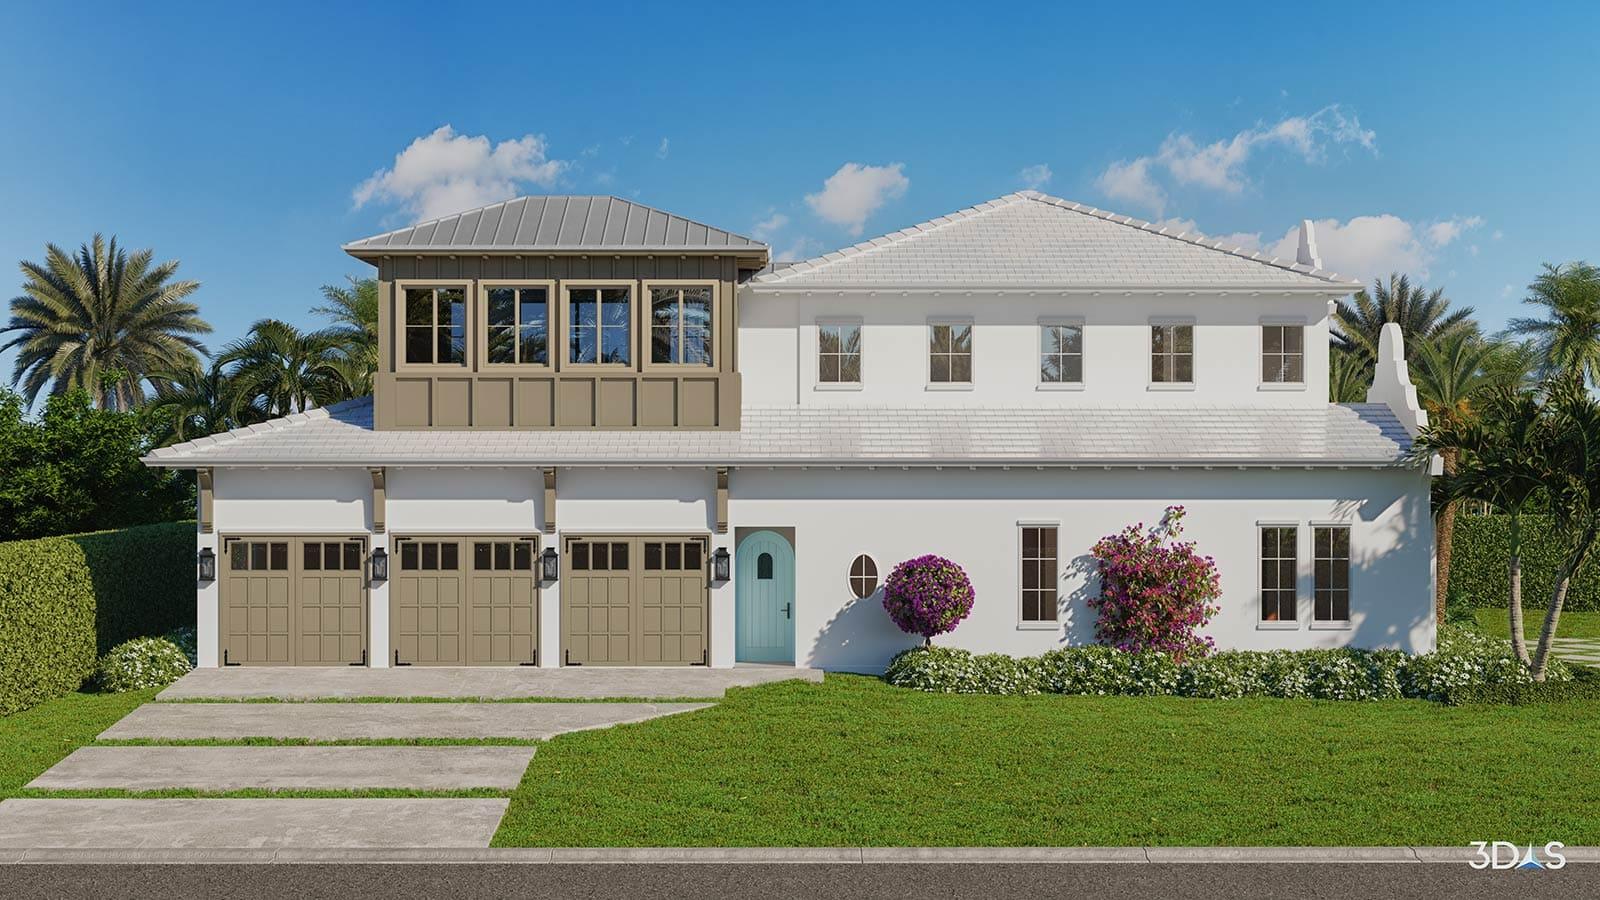 3D Elevation with Garage Doors EntryResidential 3D Rendering Naples, Florida